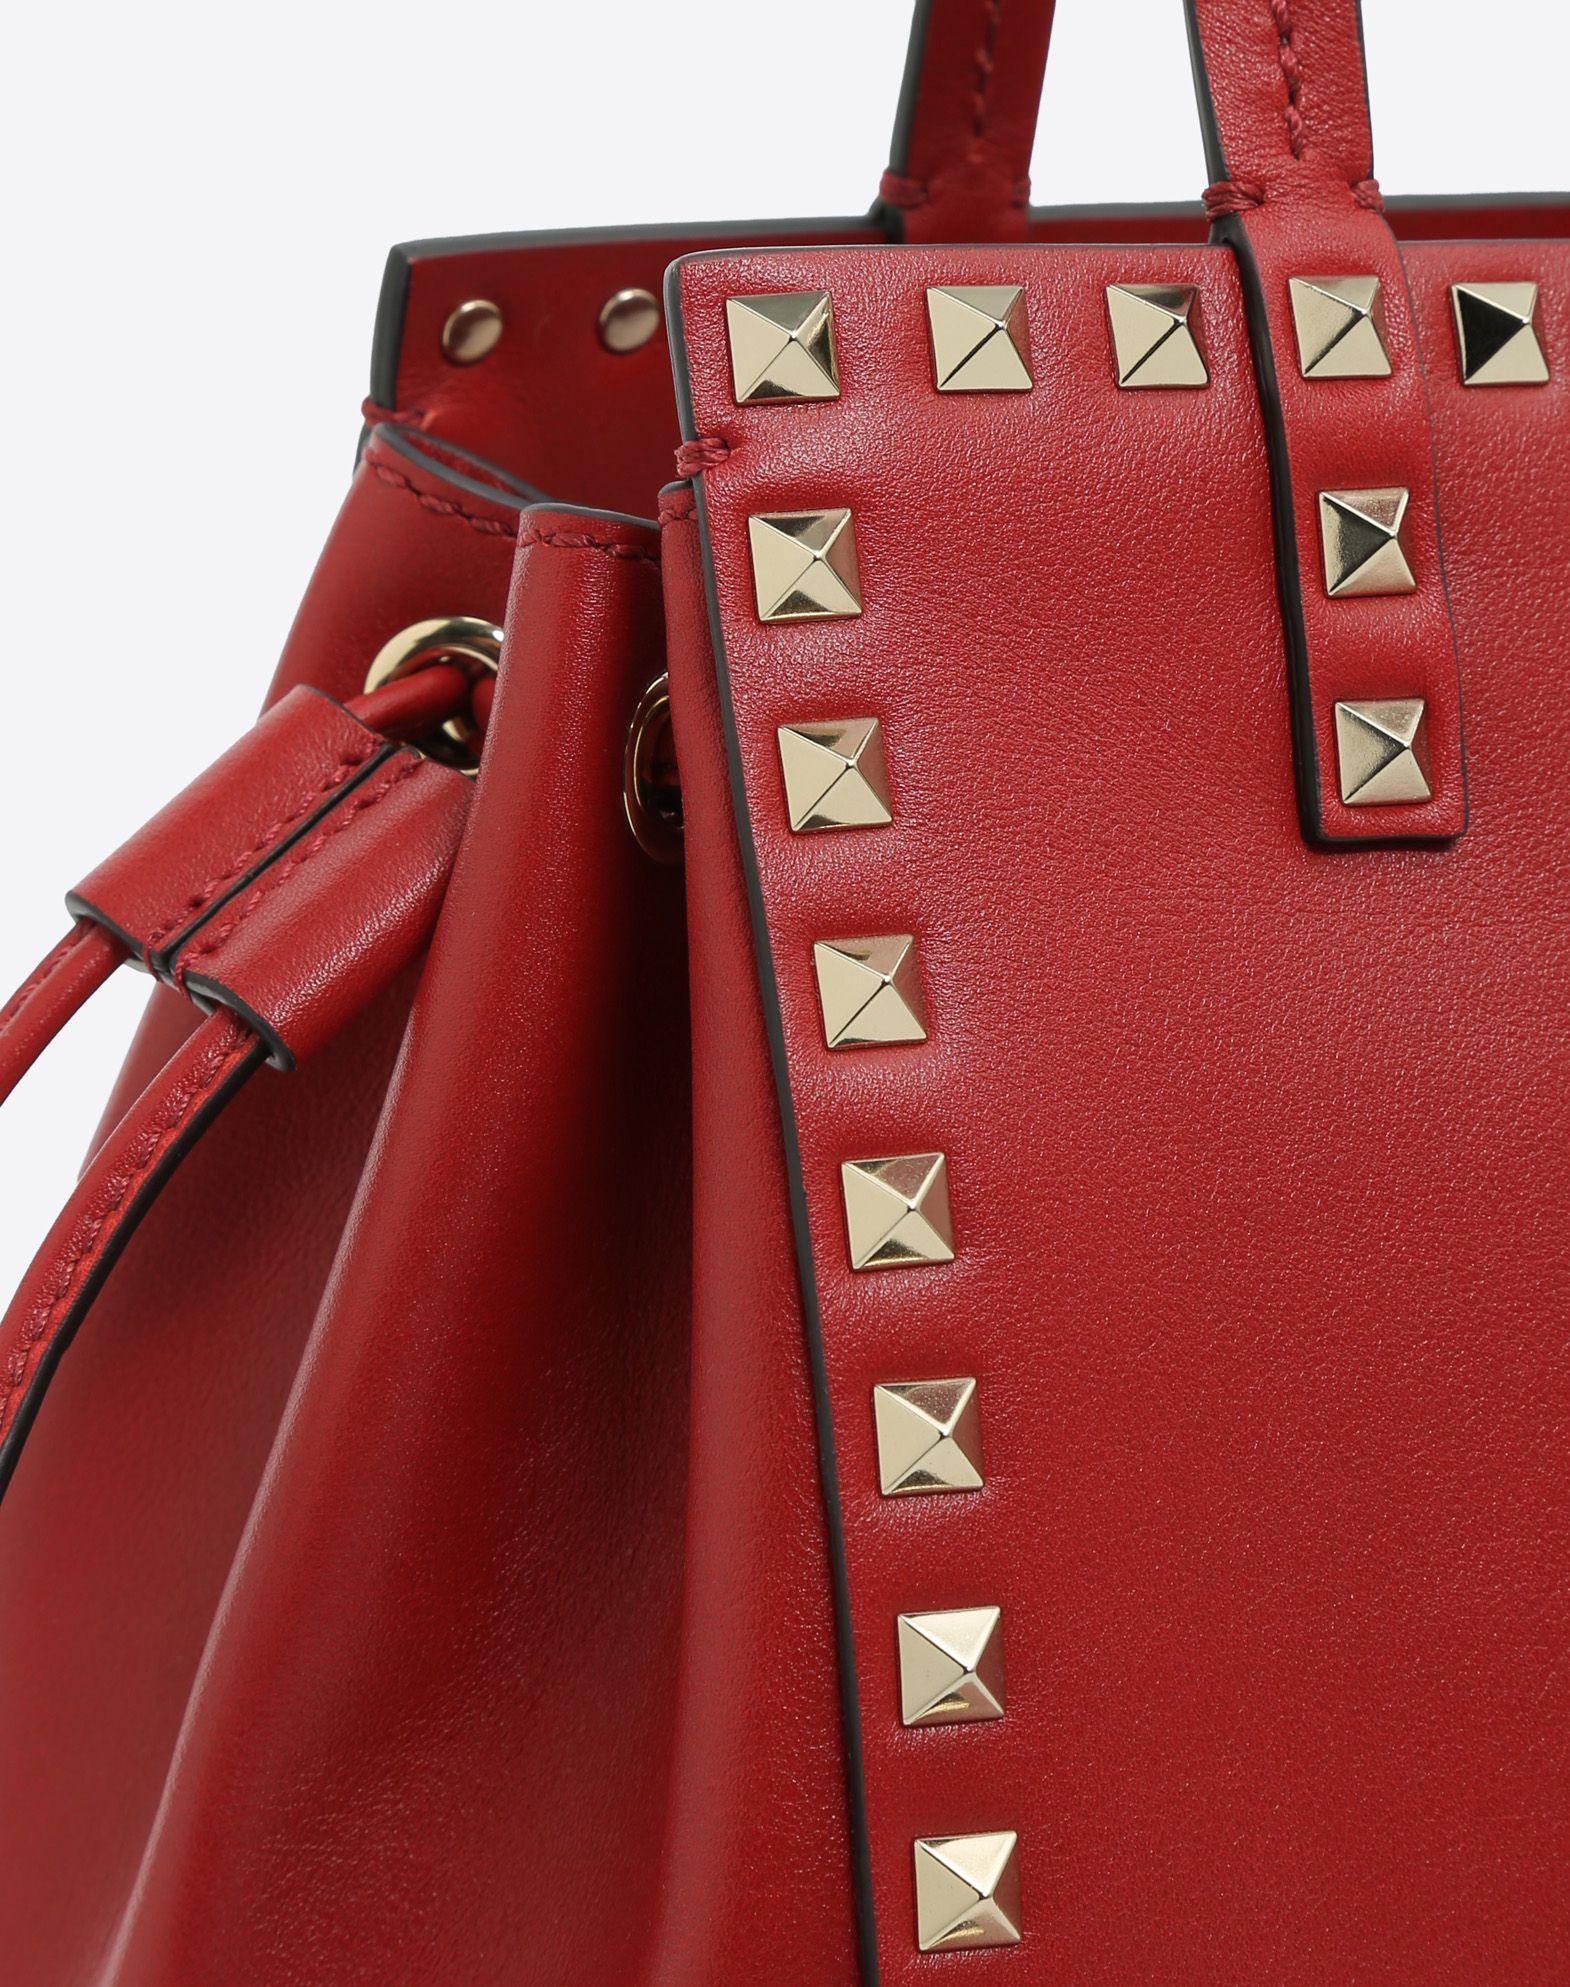 VALENTINO GARAVANI Rockstud Small Double handle Bag HANDBAG D b